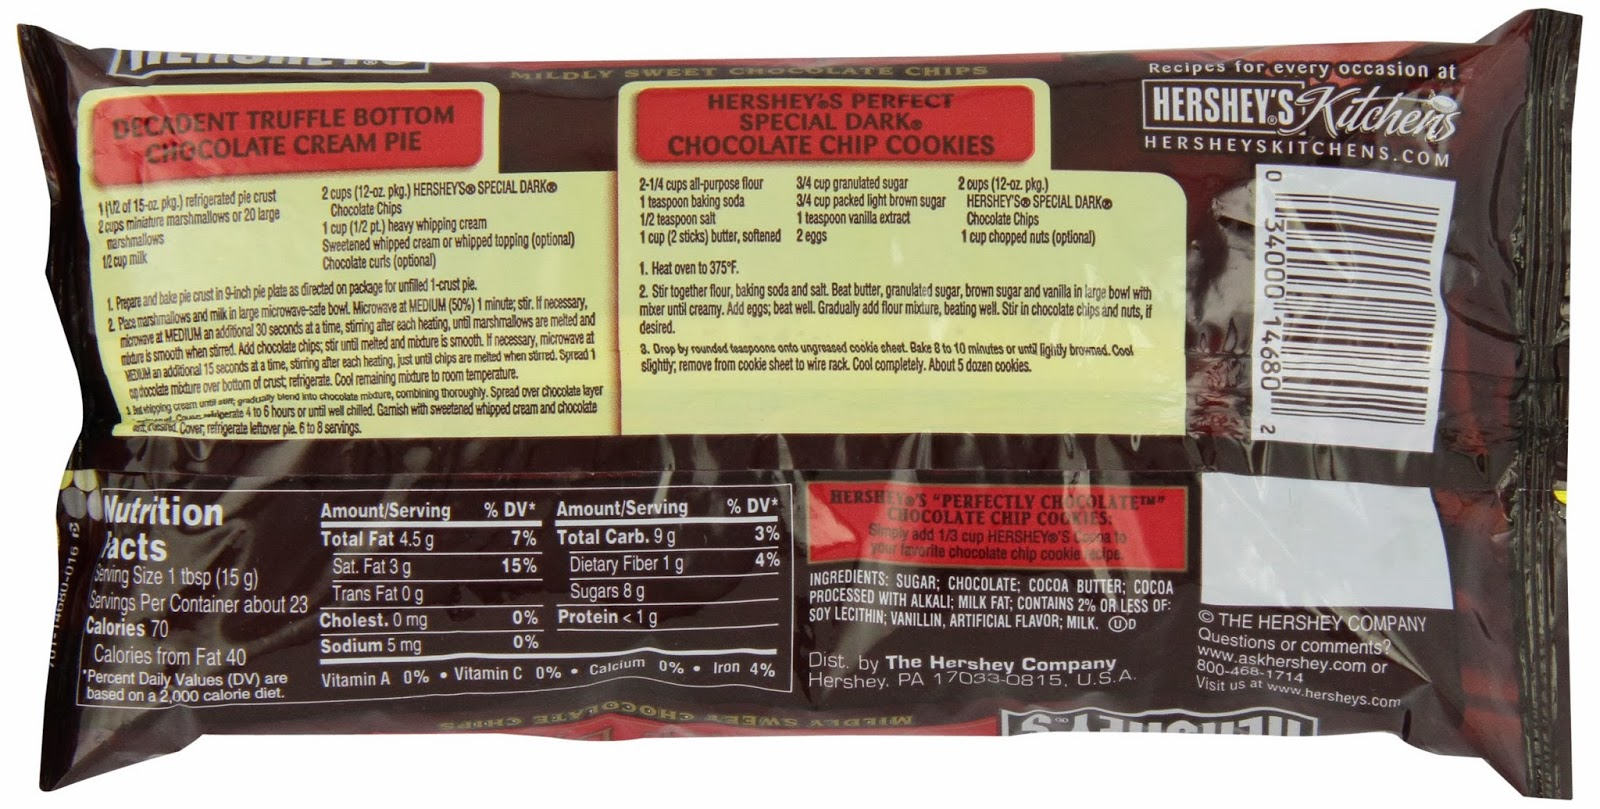 The Natural Ways Of Life: Enjoy Life Dark Chocolate Morsels Review